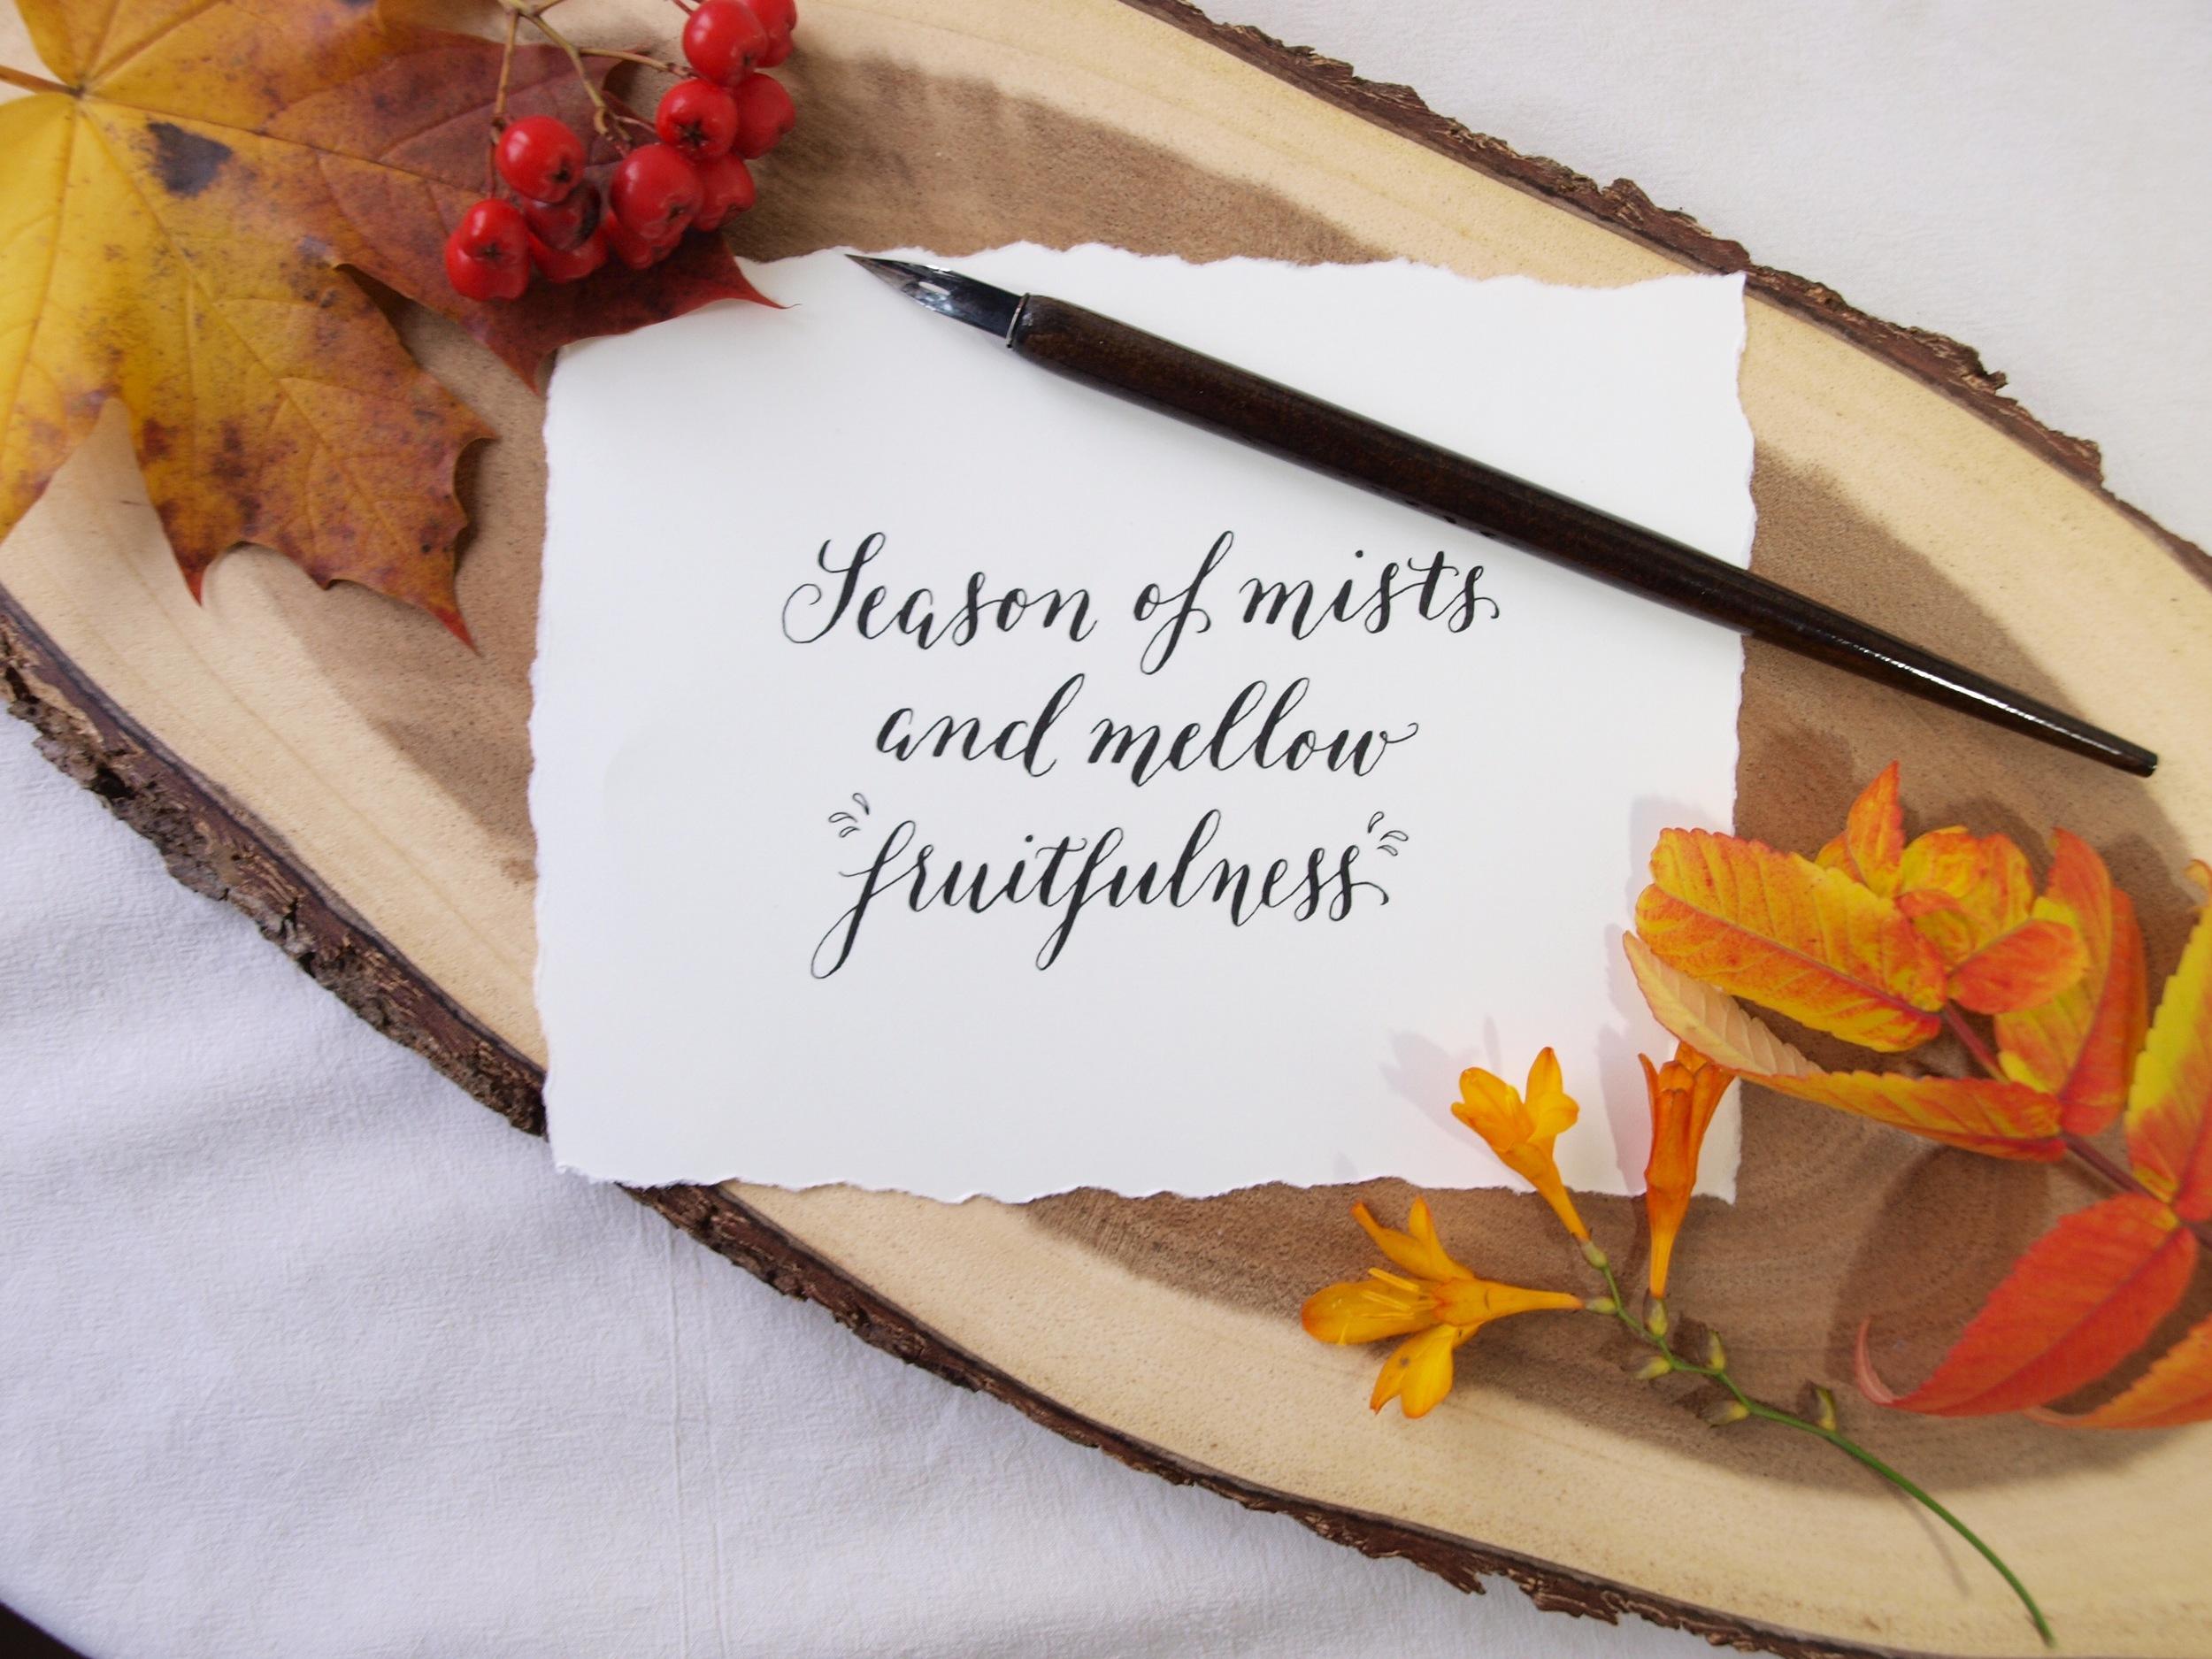 Modern calligraphy season of mists 3 .jpg